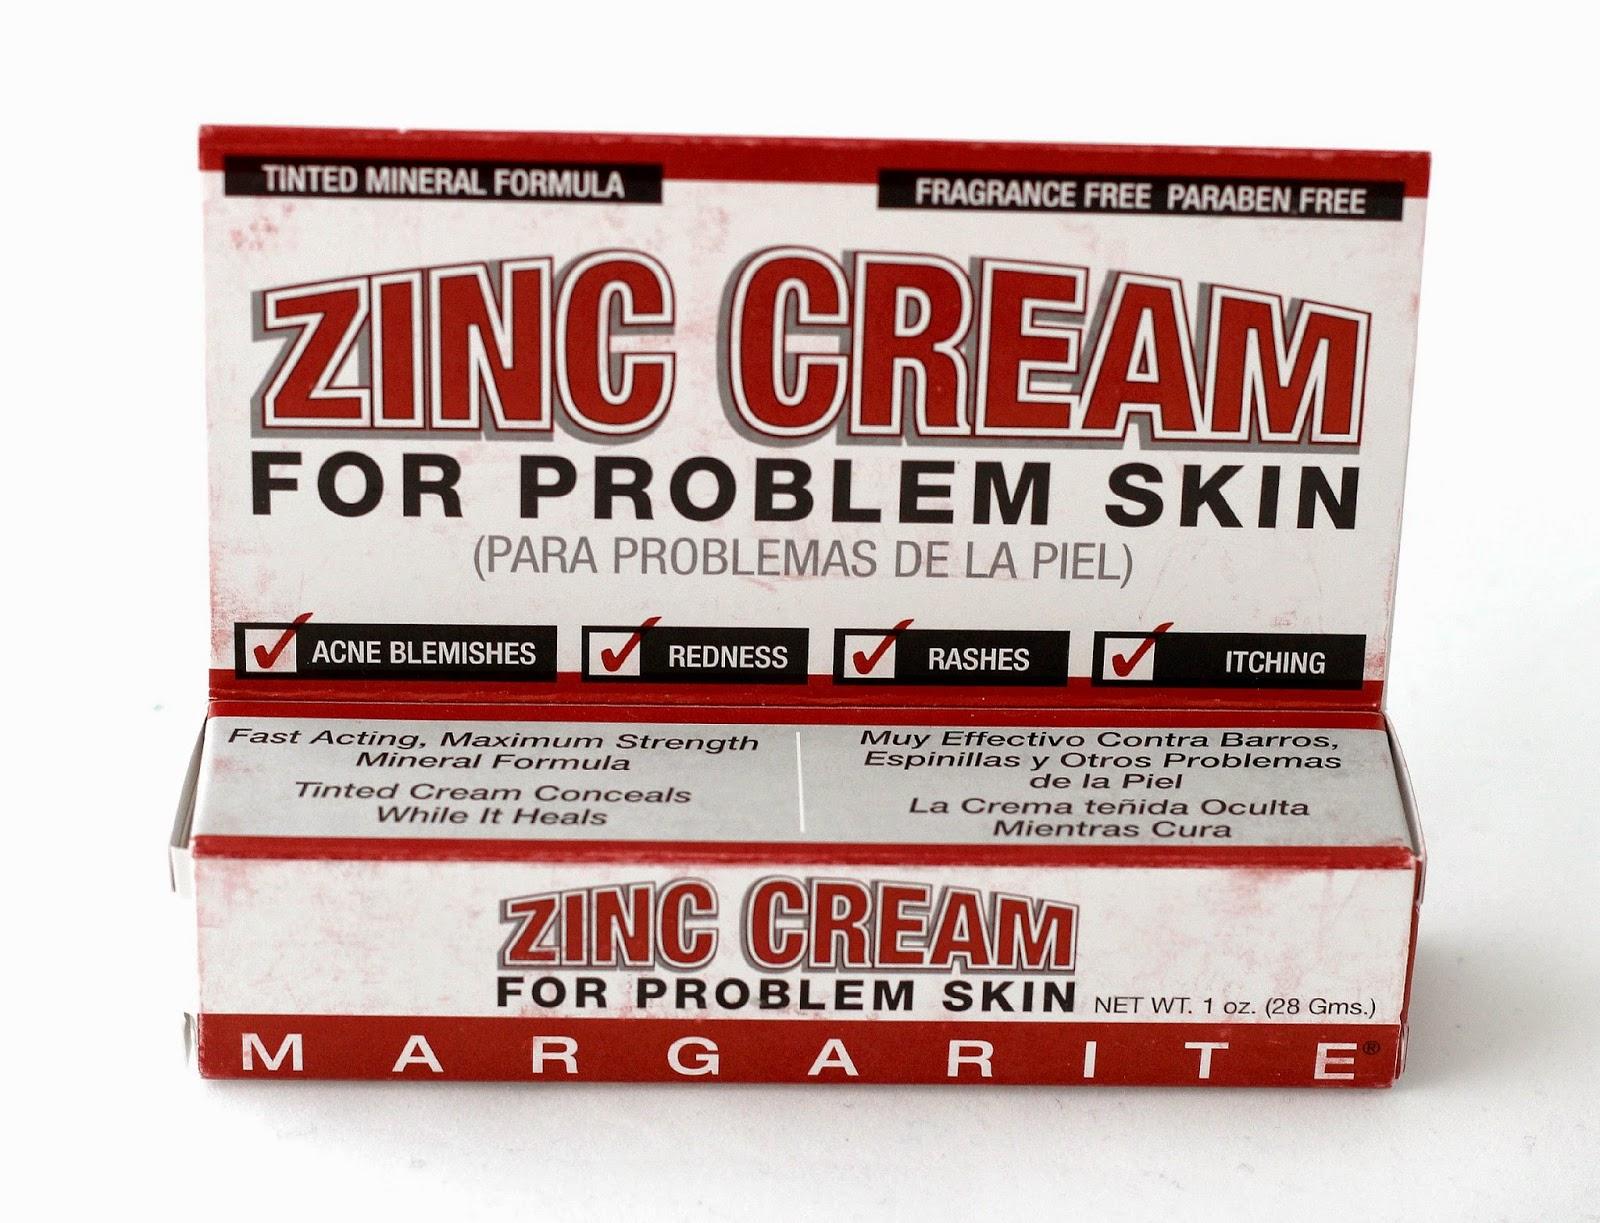 Zinc cream for problem skin review